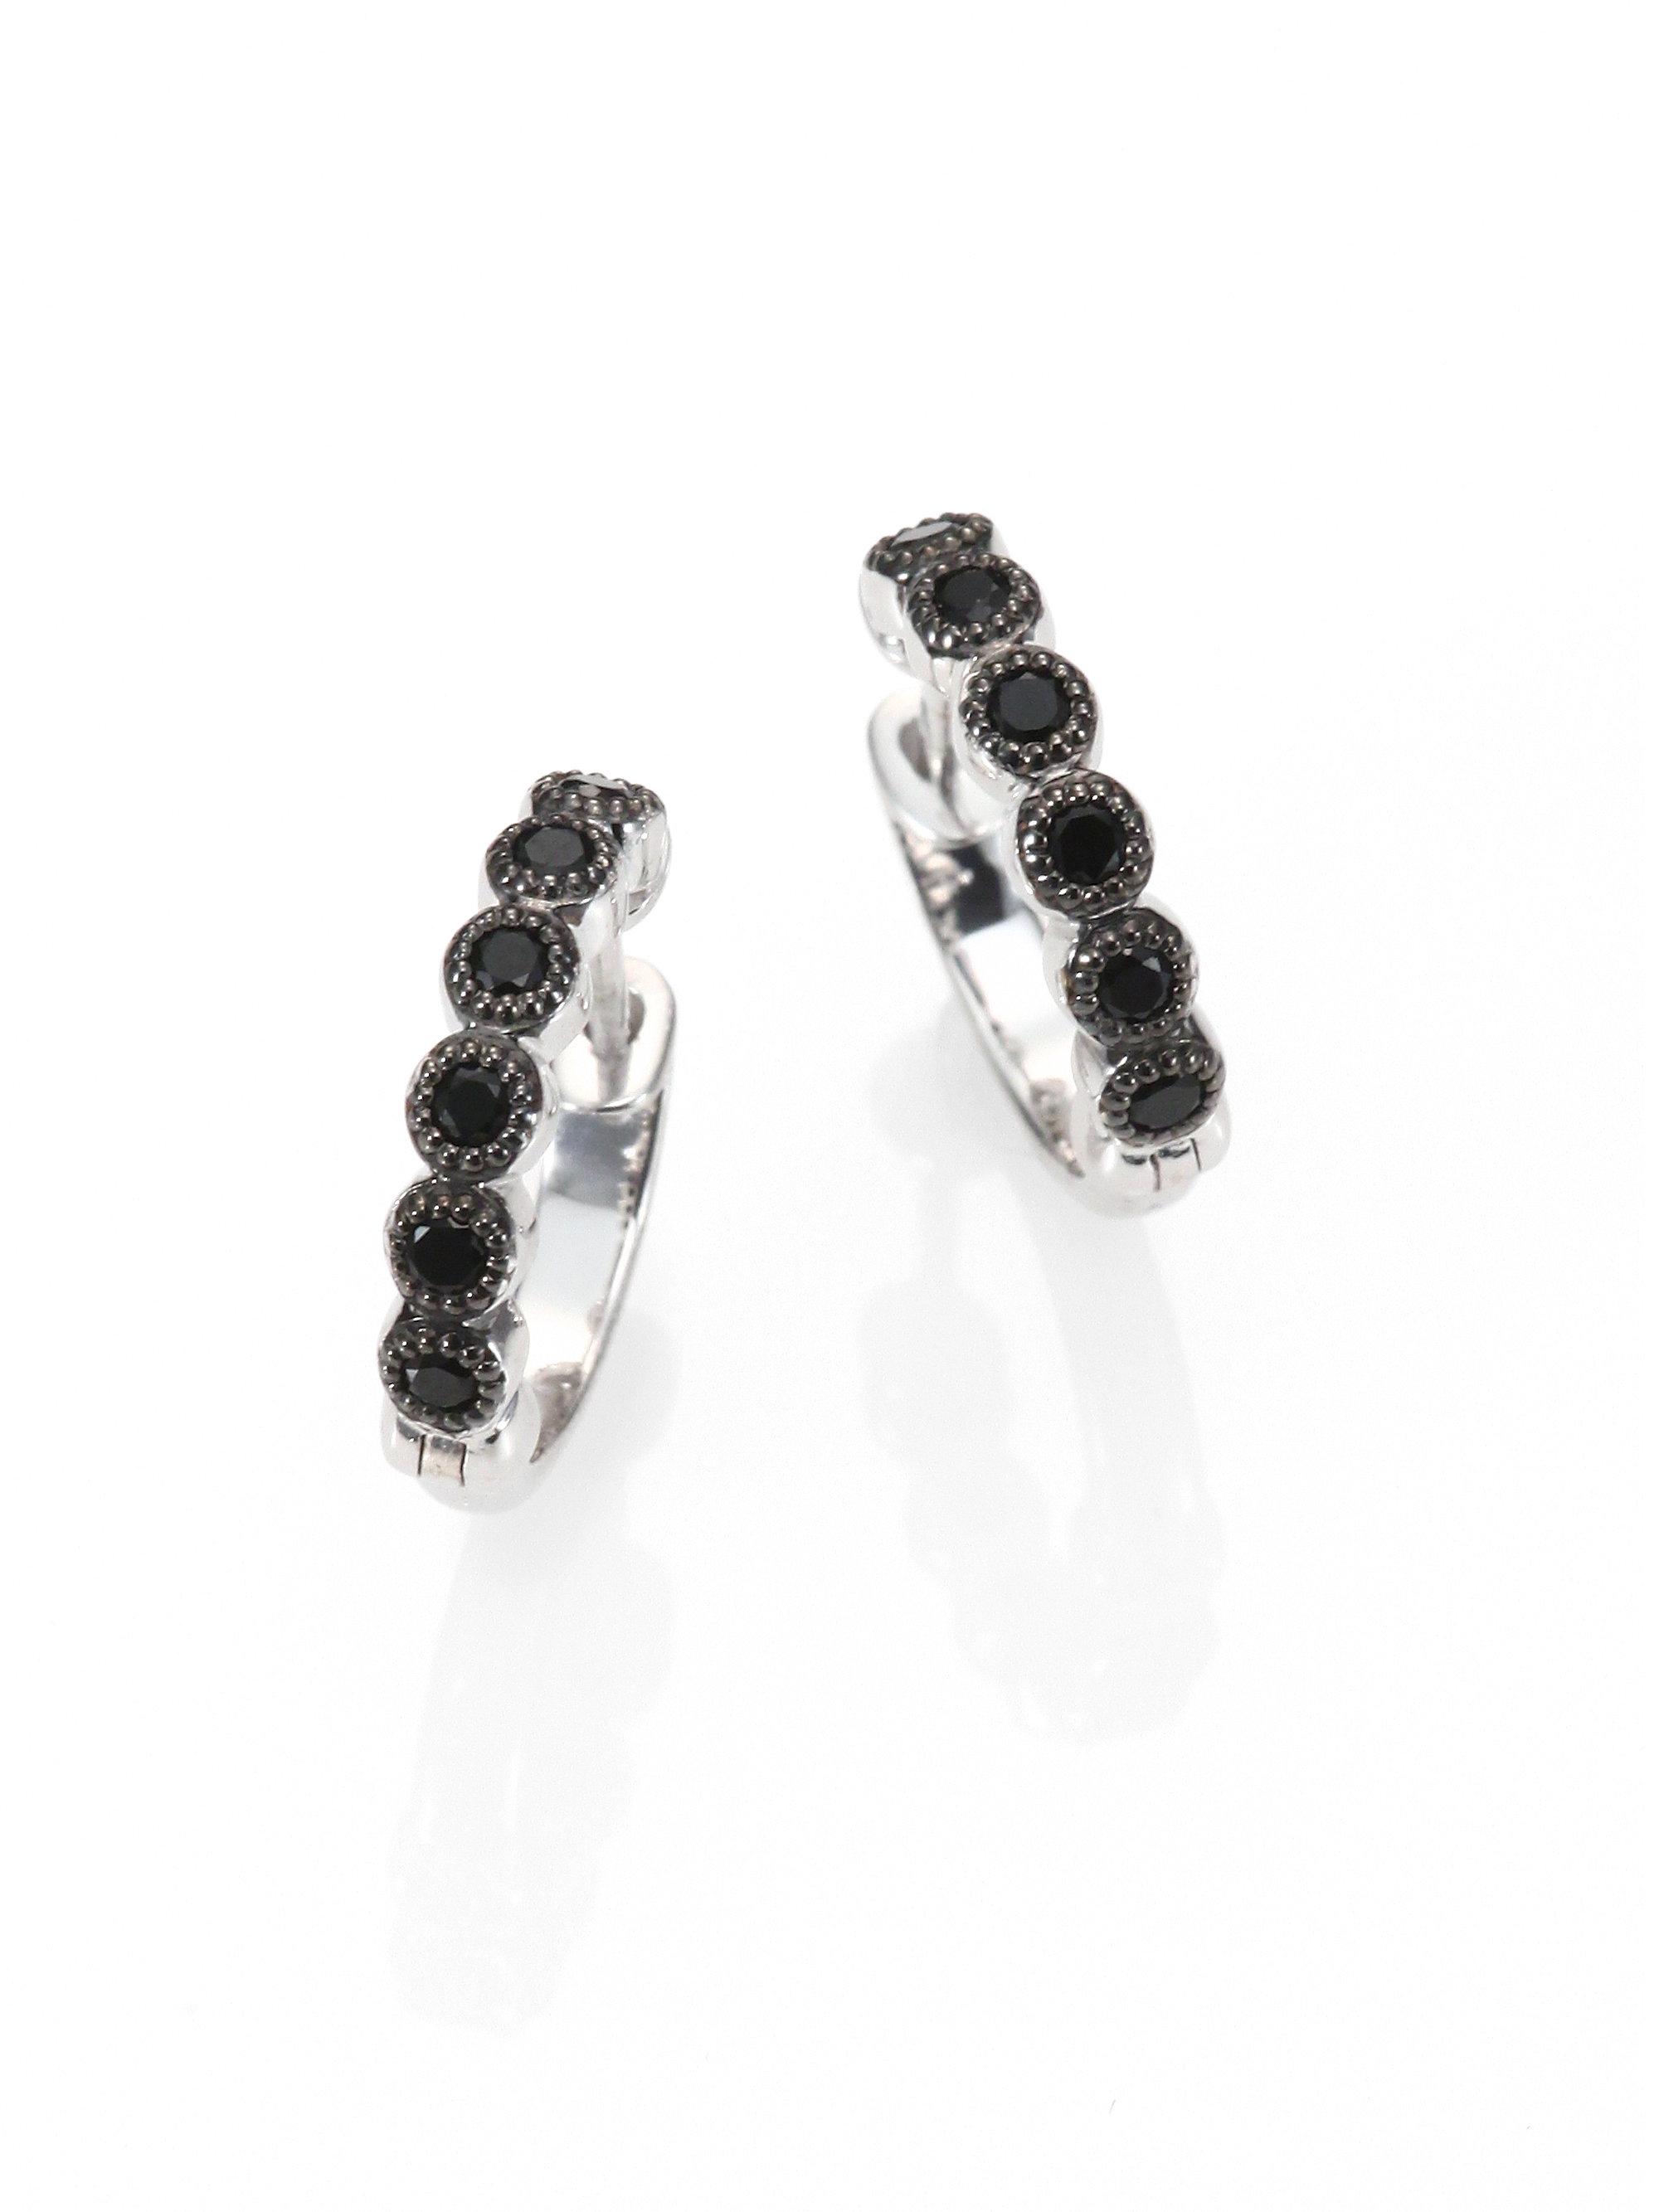 Lyst - Jude Frances Black Spinel   Sterling Silver Hoop Earrings 0.5 ... 5f0858ca7251